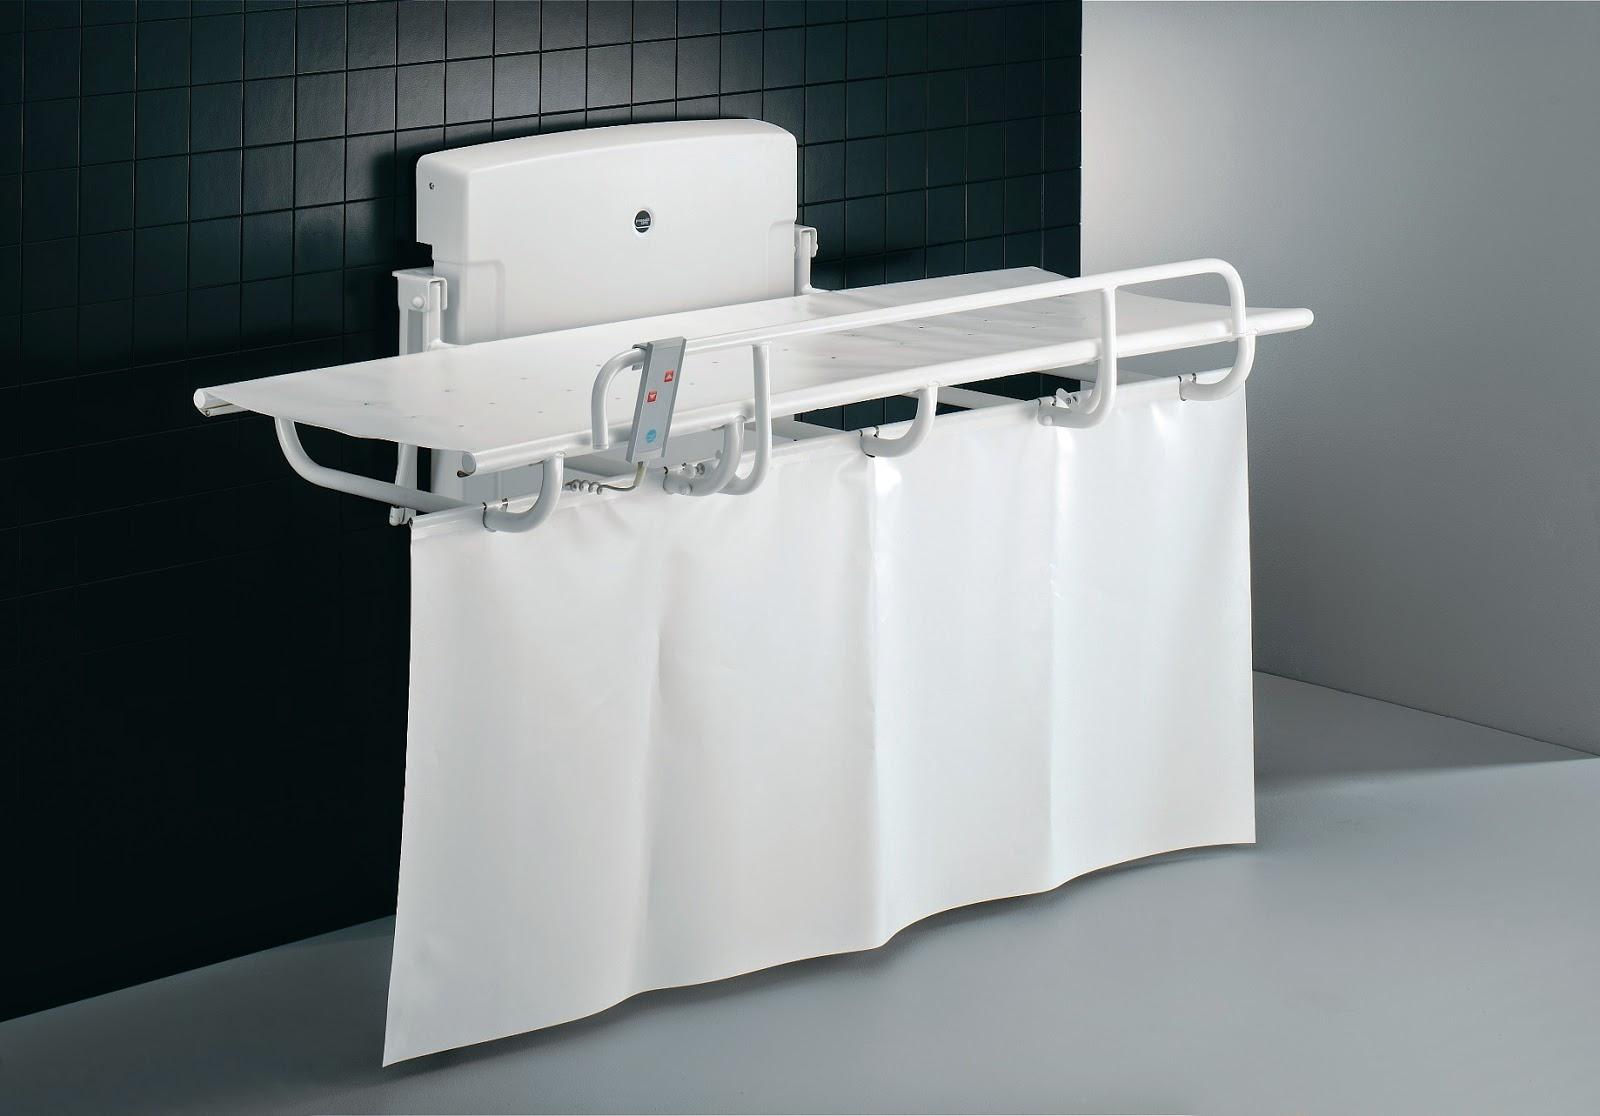 Pressalit Powered Nursing Bench with Splash Curtain